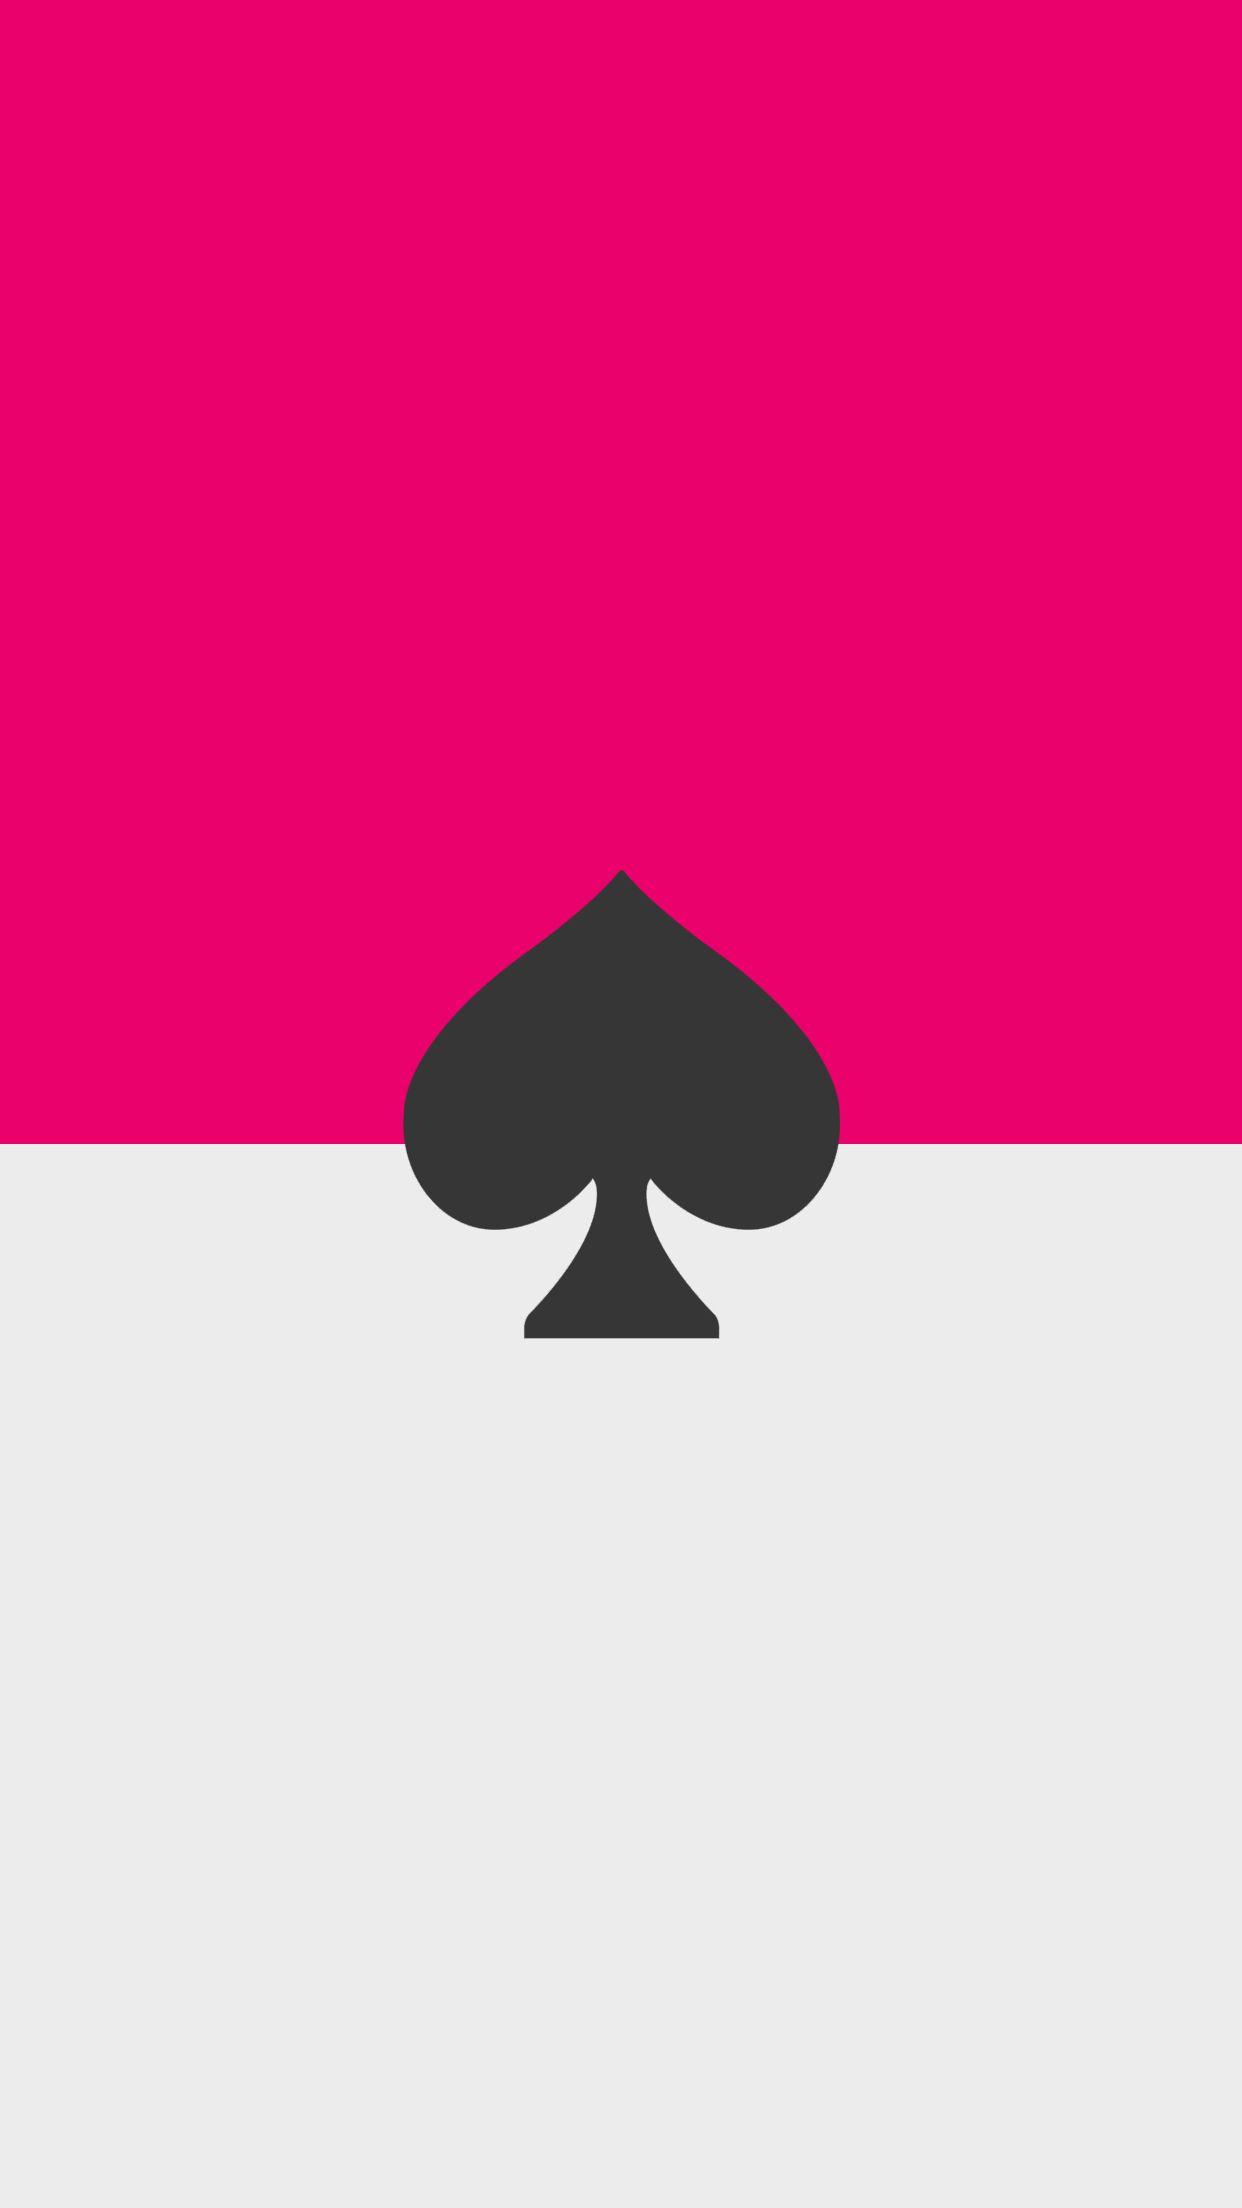 Kate spade hot pink black iPhone Wallpaper Background